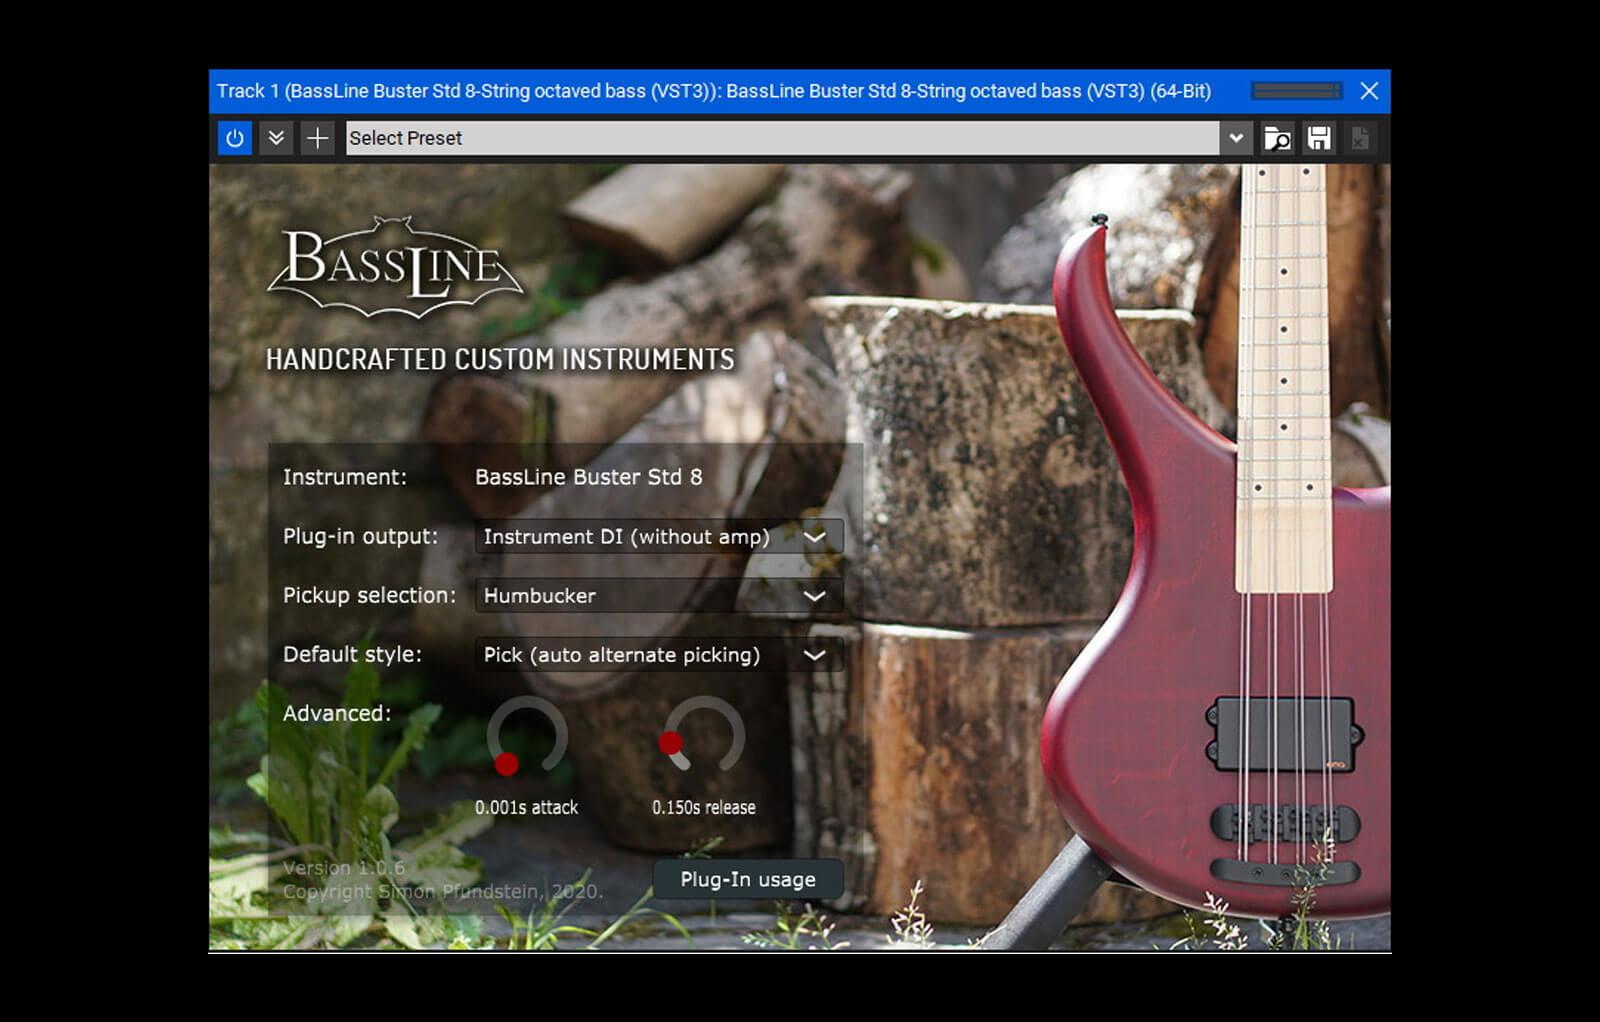 BassLine Buster Std 8